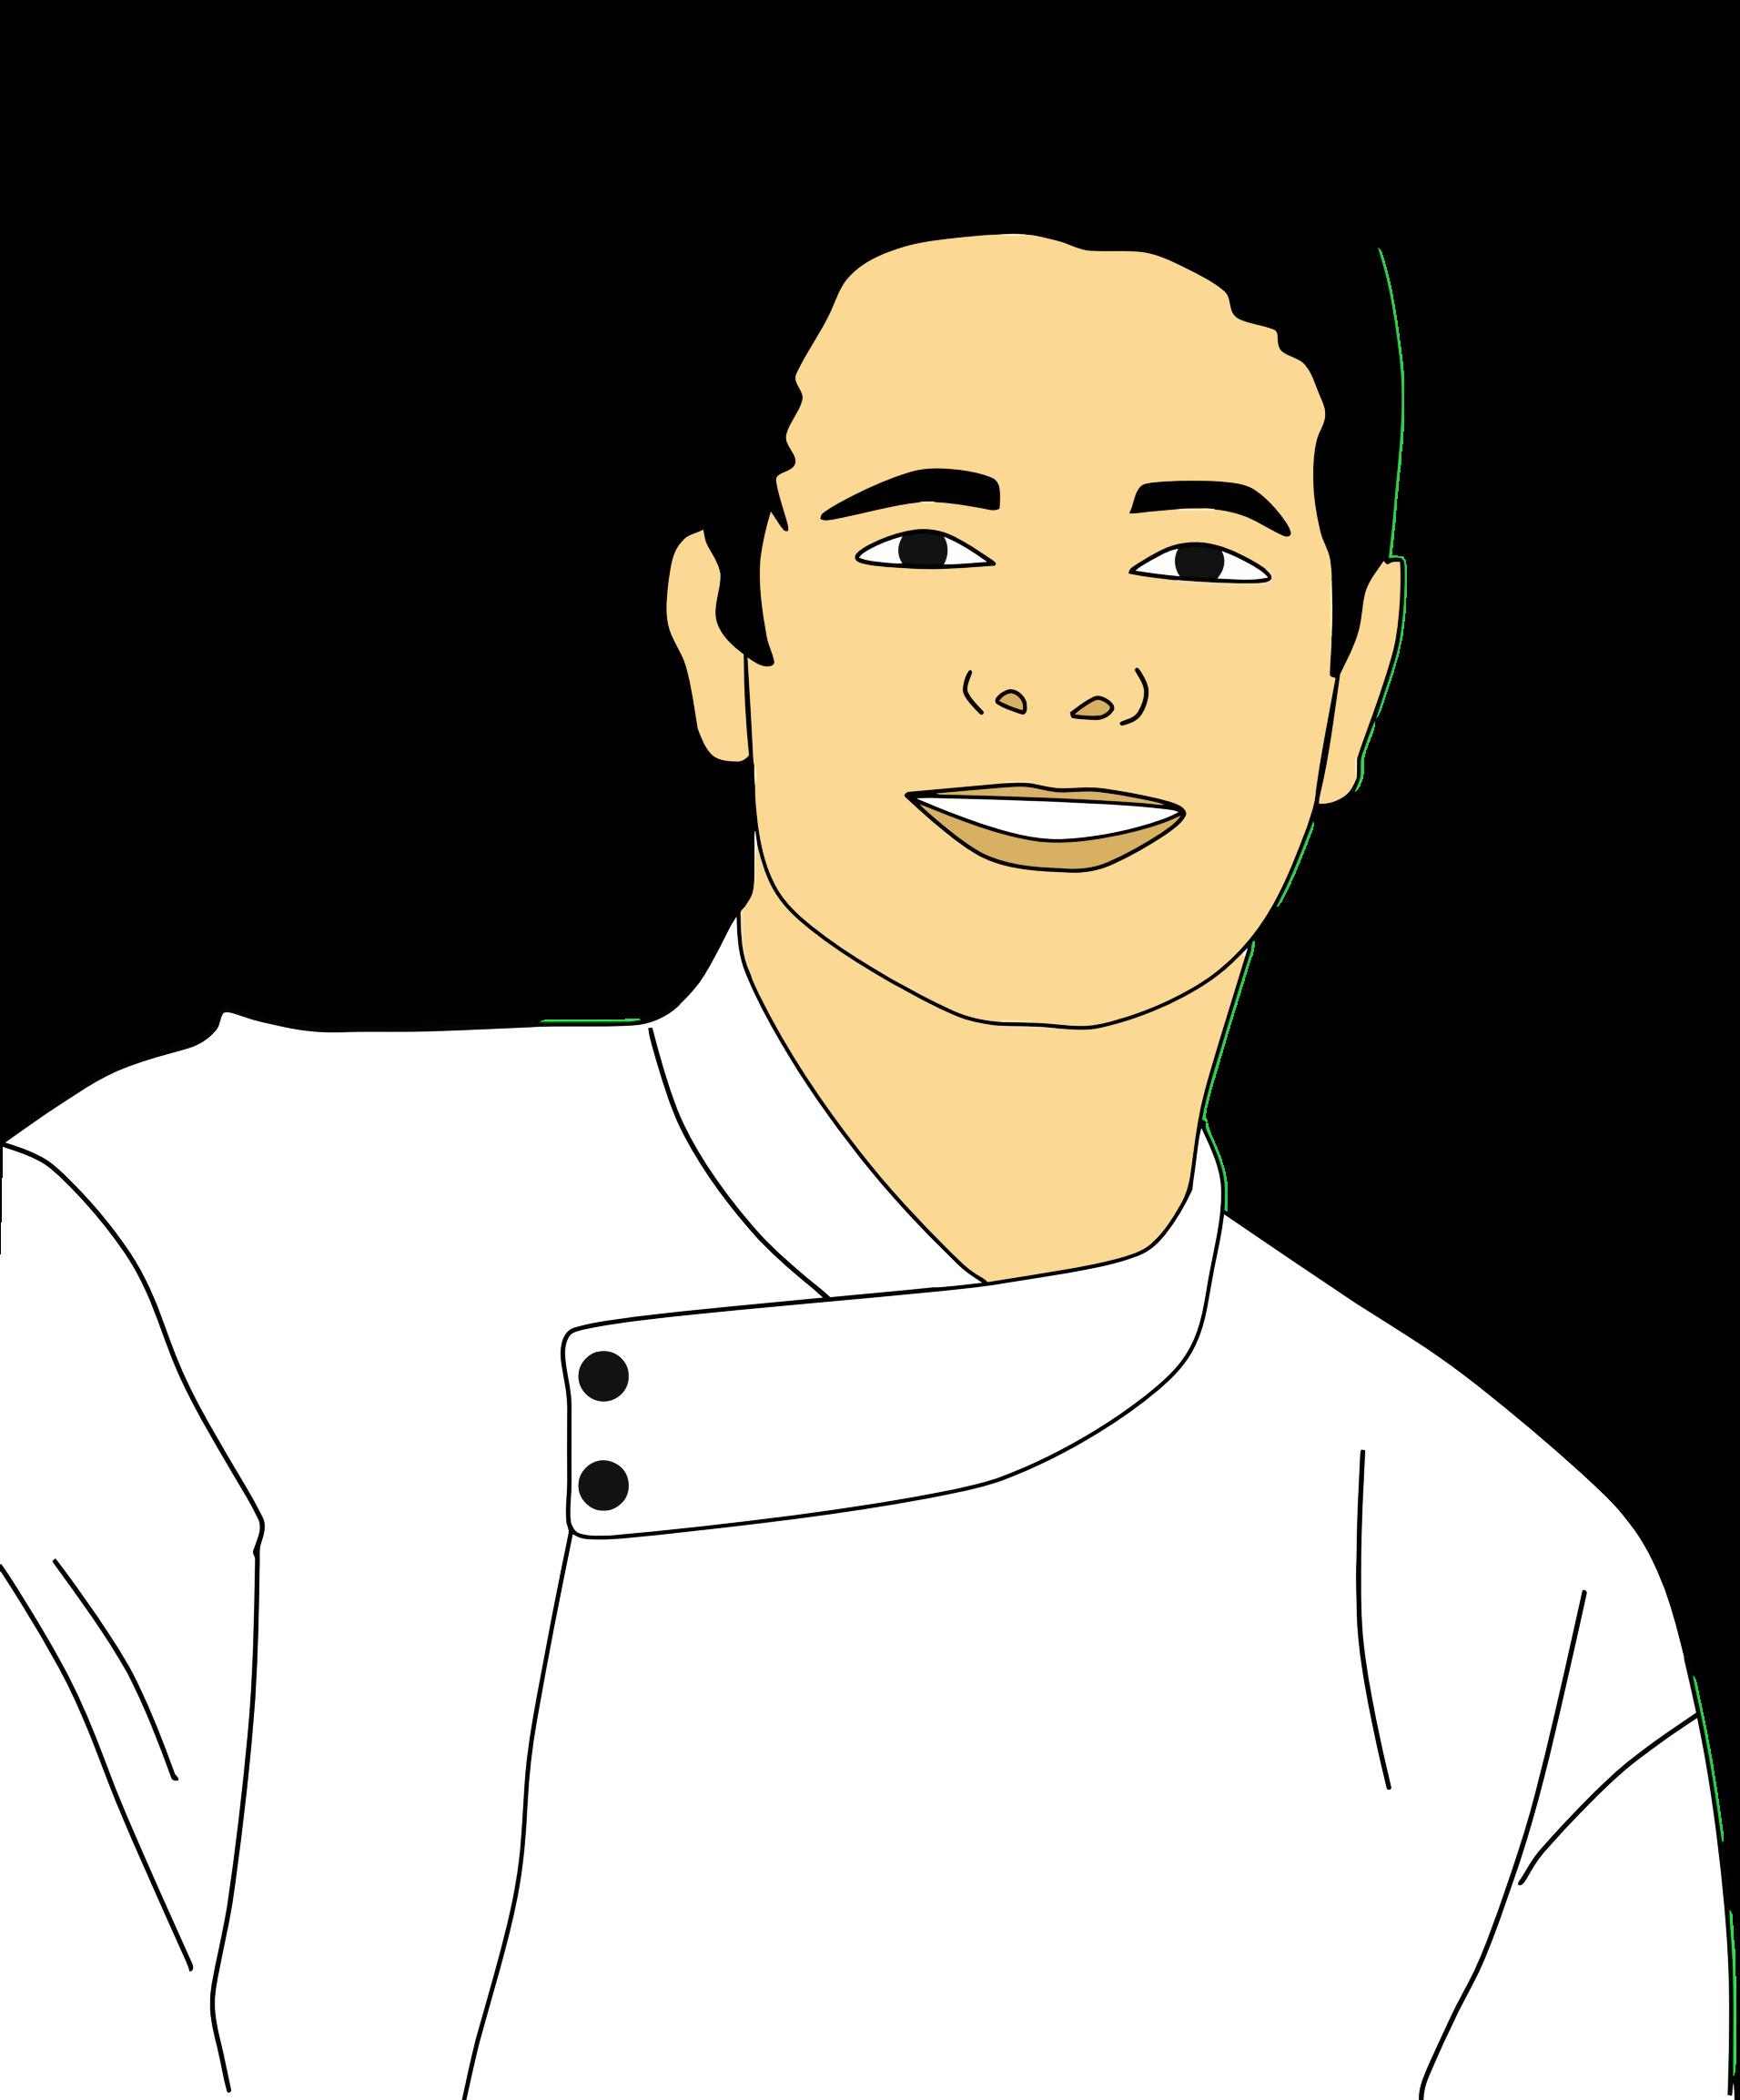 Faces clipart male character. Chef portrait big image